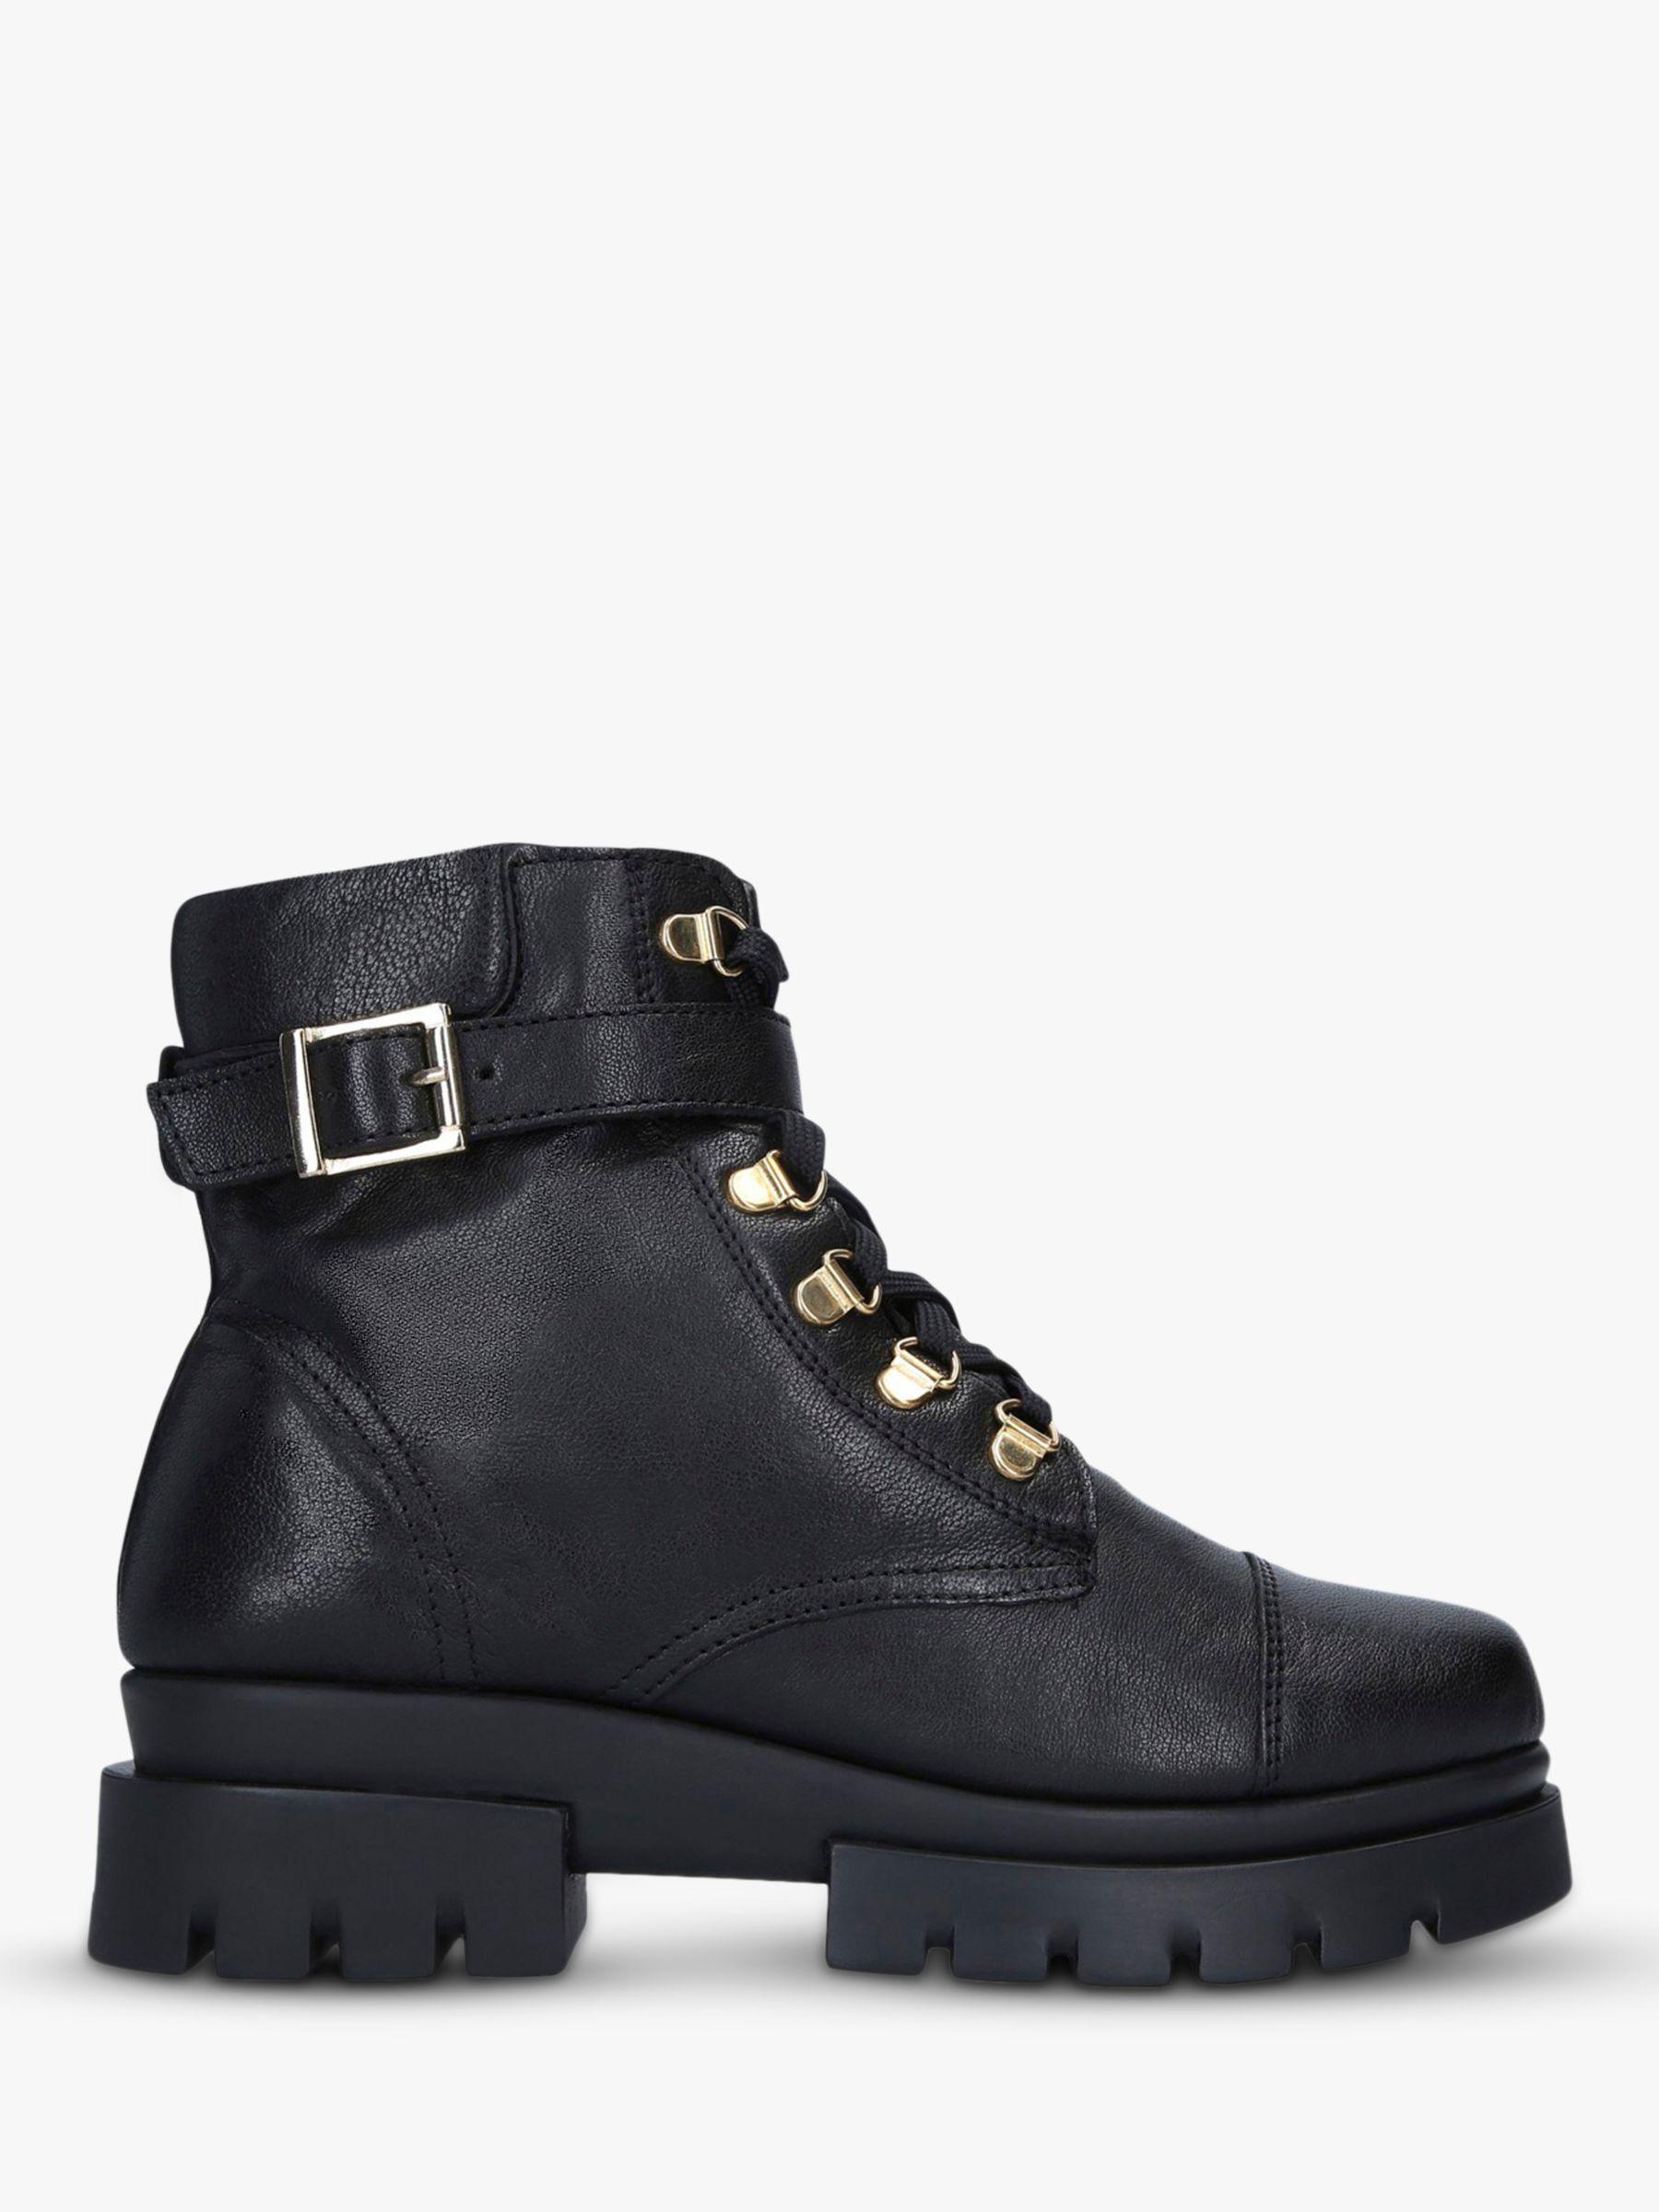 Carvela Comfort Carvela Comfort Run Leather Hiker Boots, Black